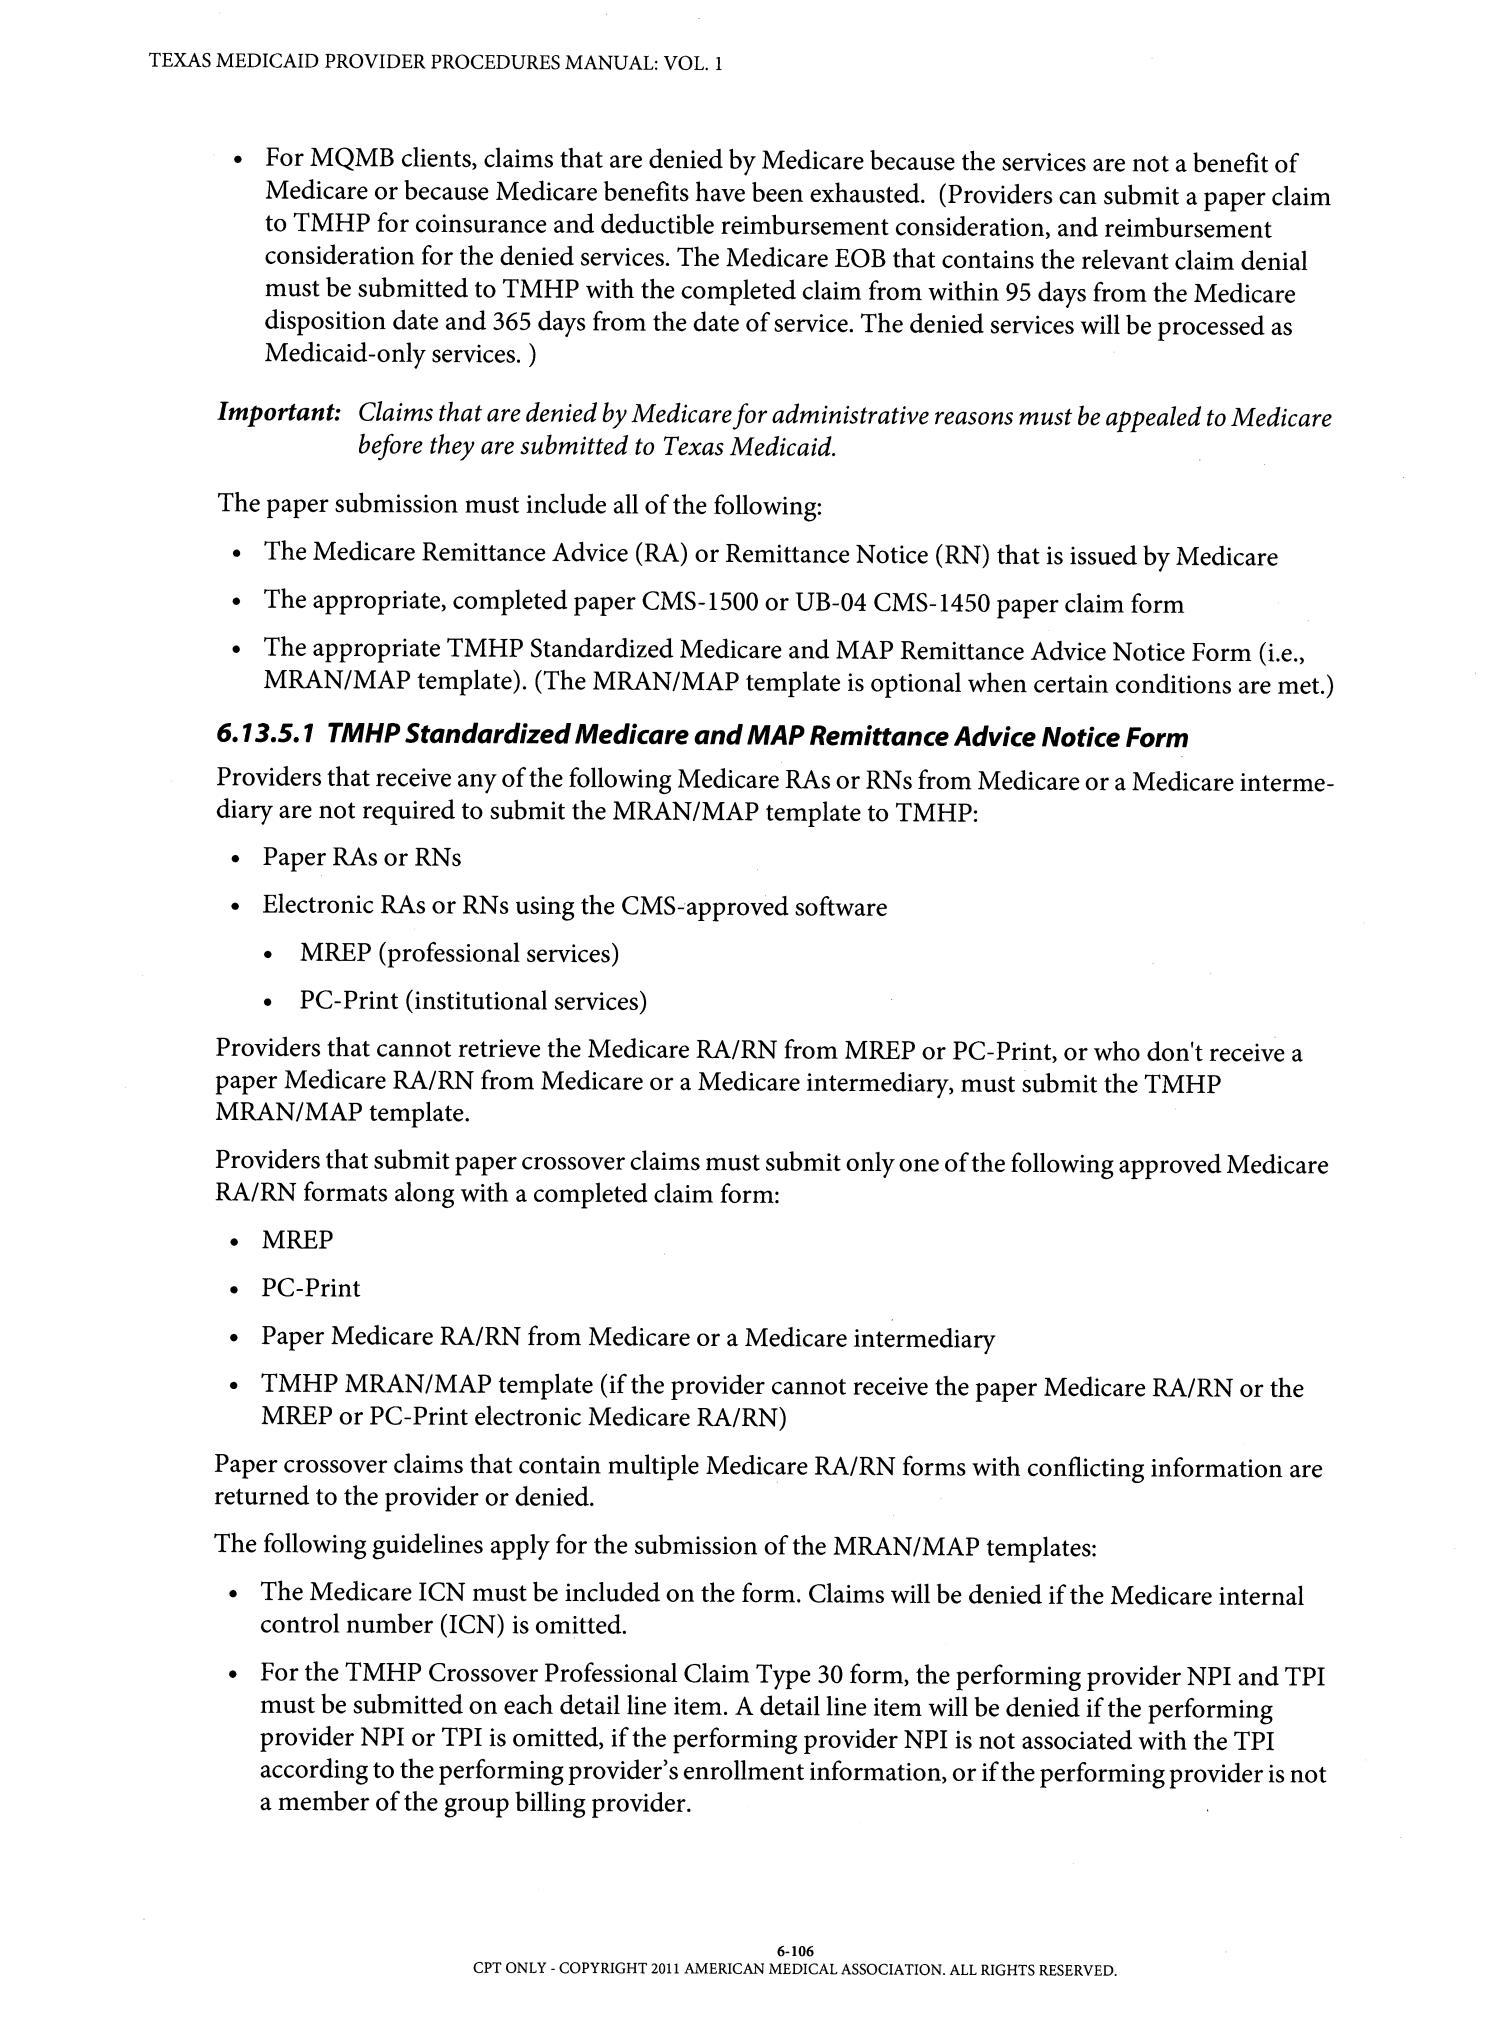 Az Medicaid Provider Manual Manual Guide